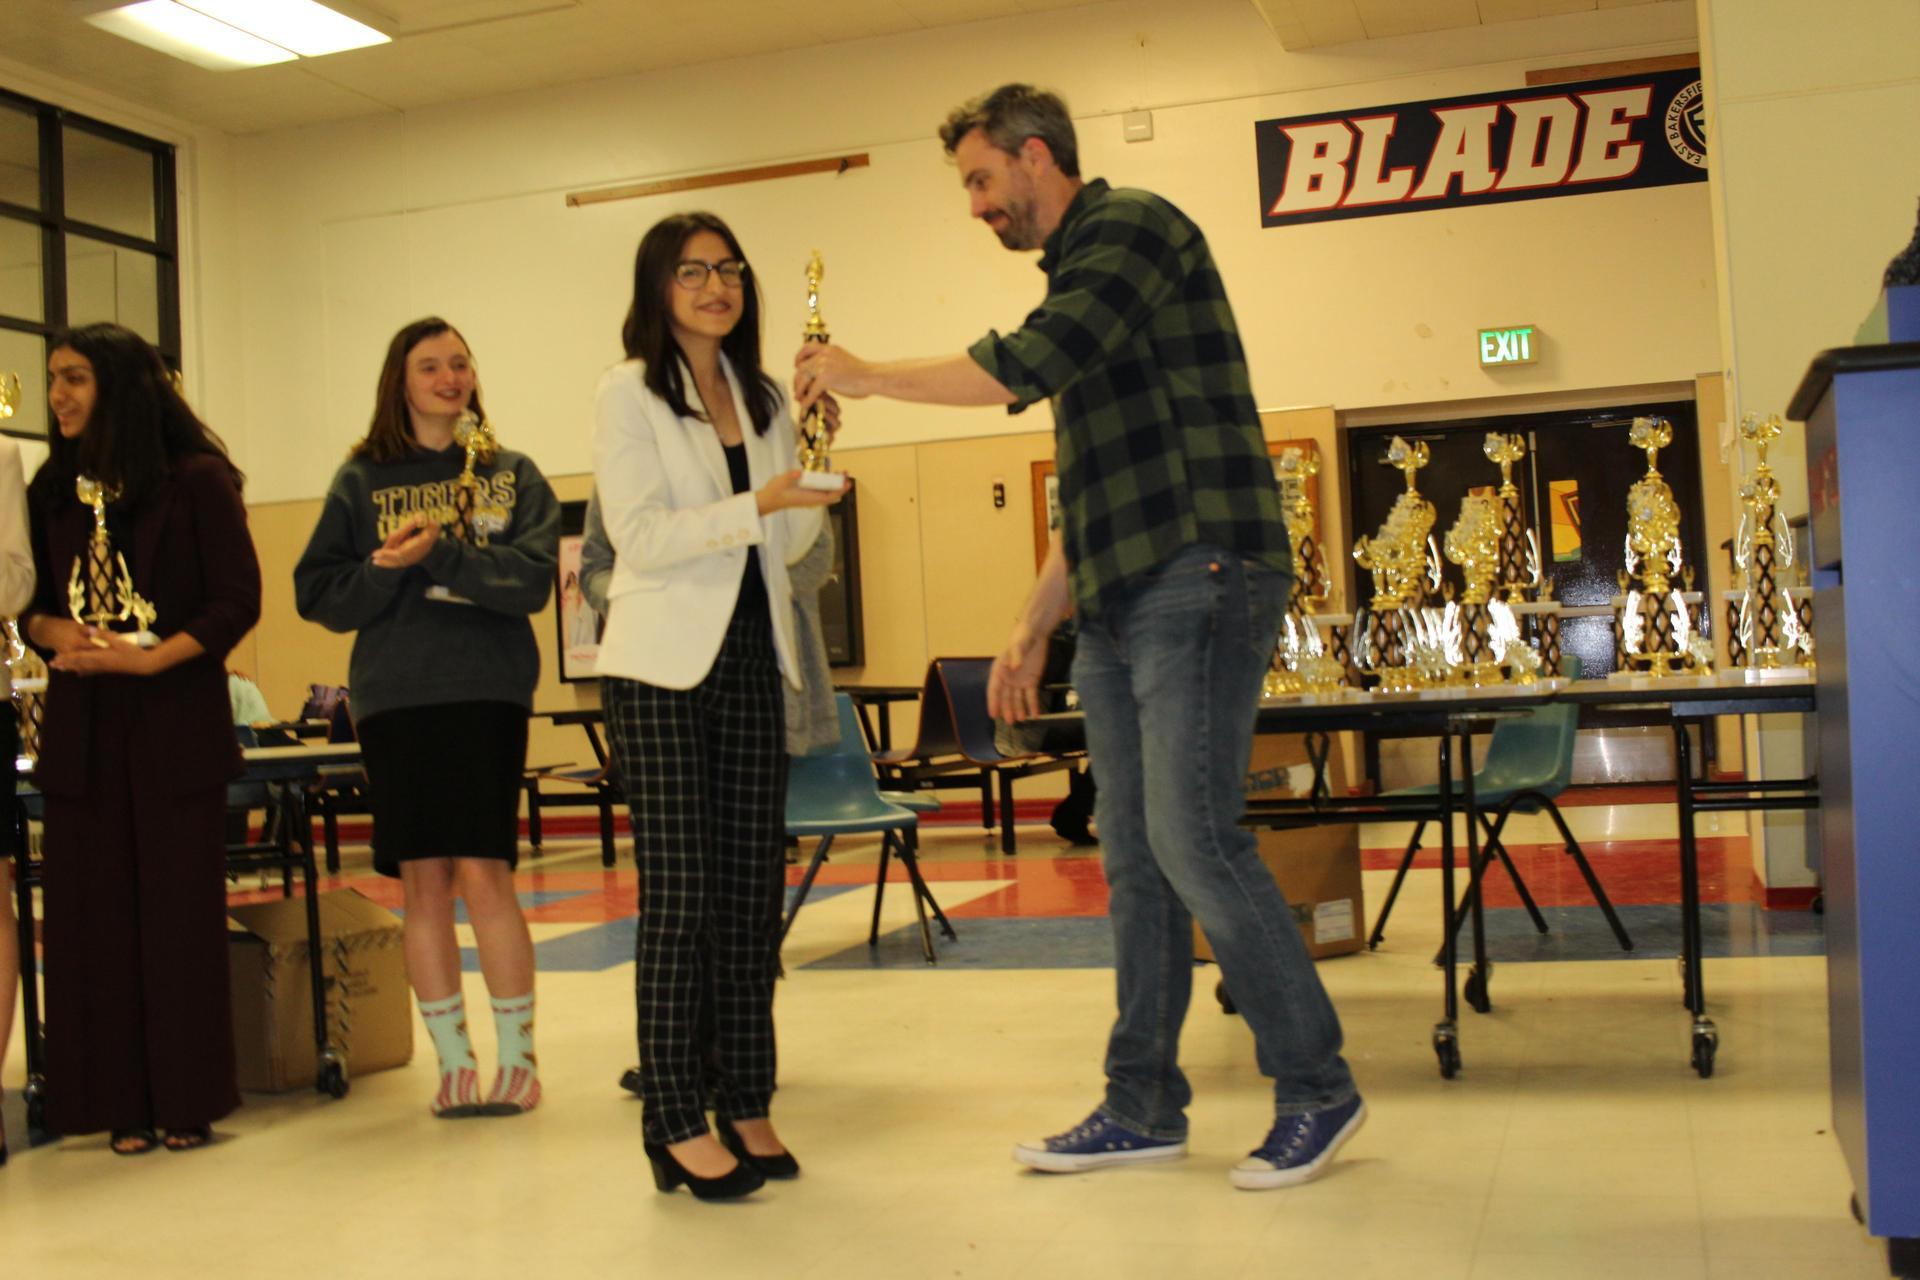 Daneli Santillan receiving a trophy